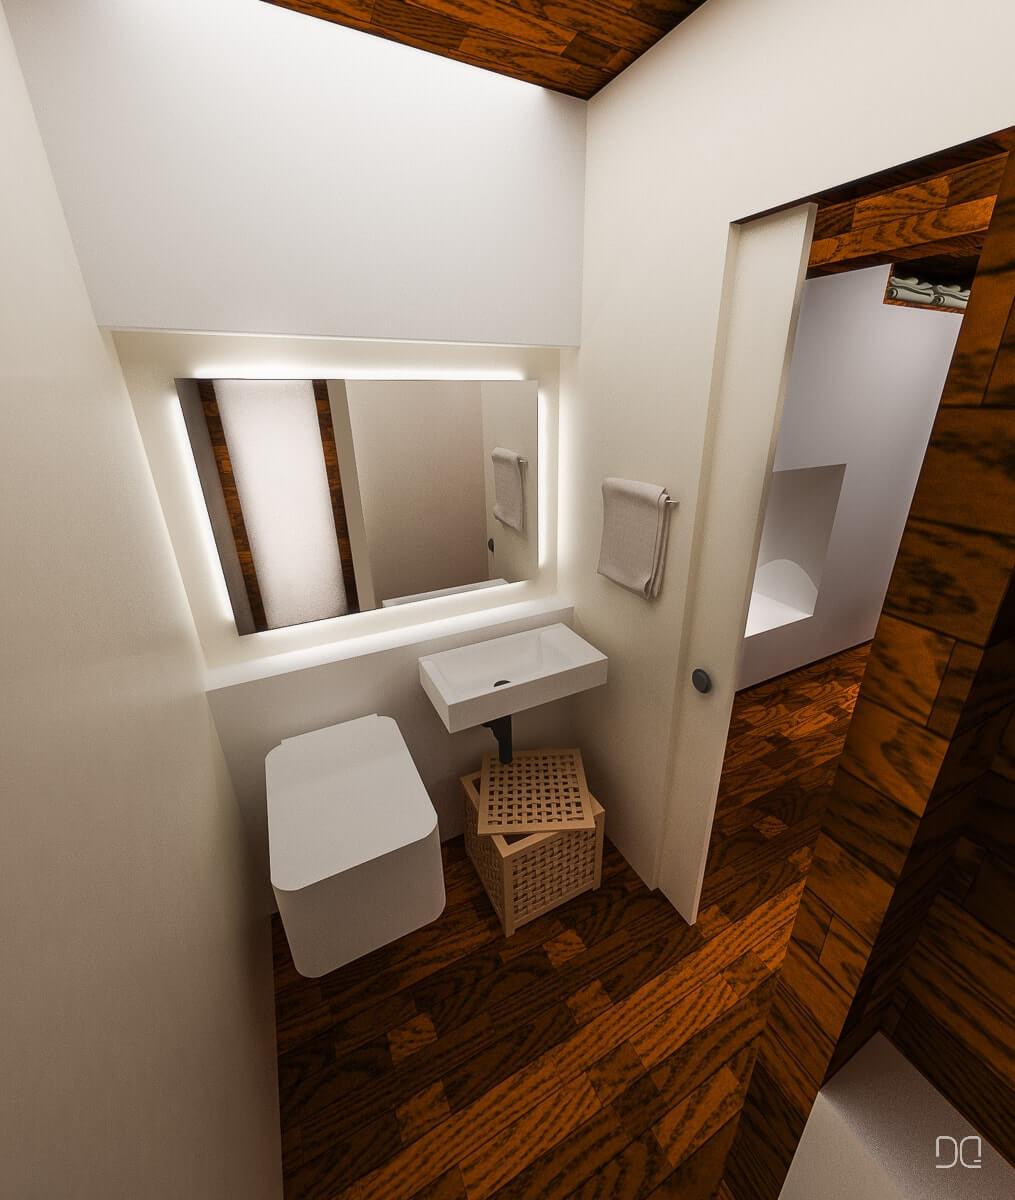 DQ-arquitectura-y-paisaje-minicasa-madera-baño